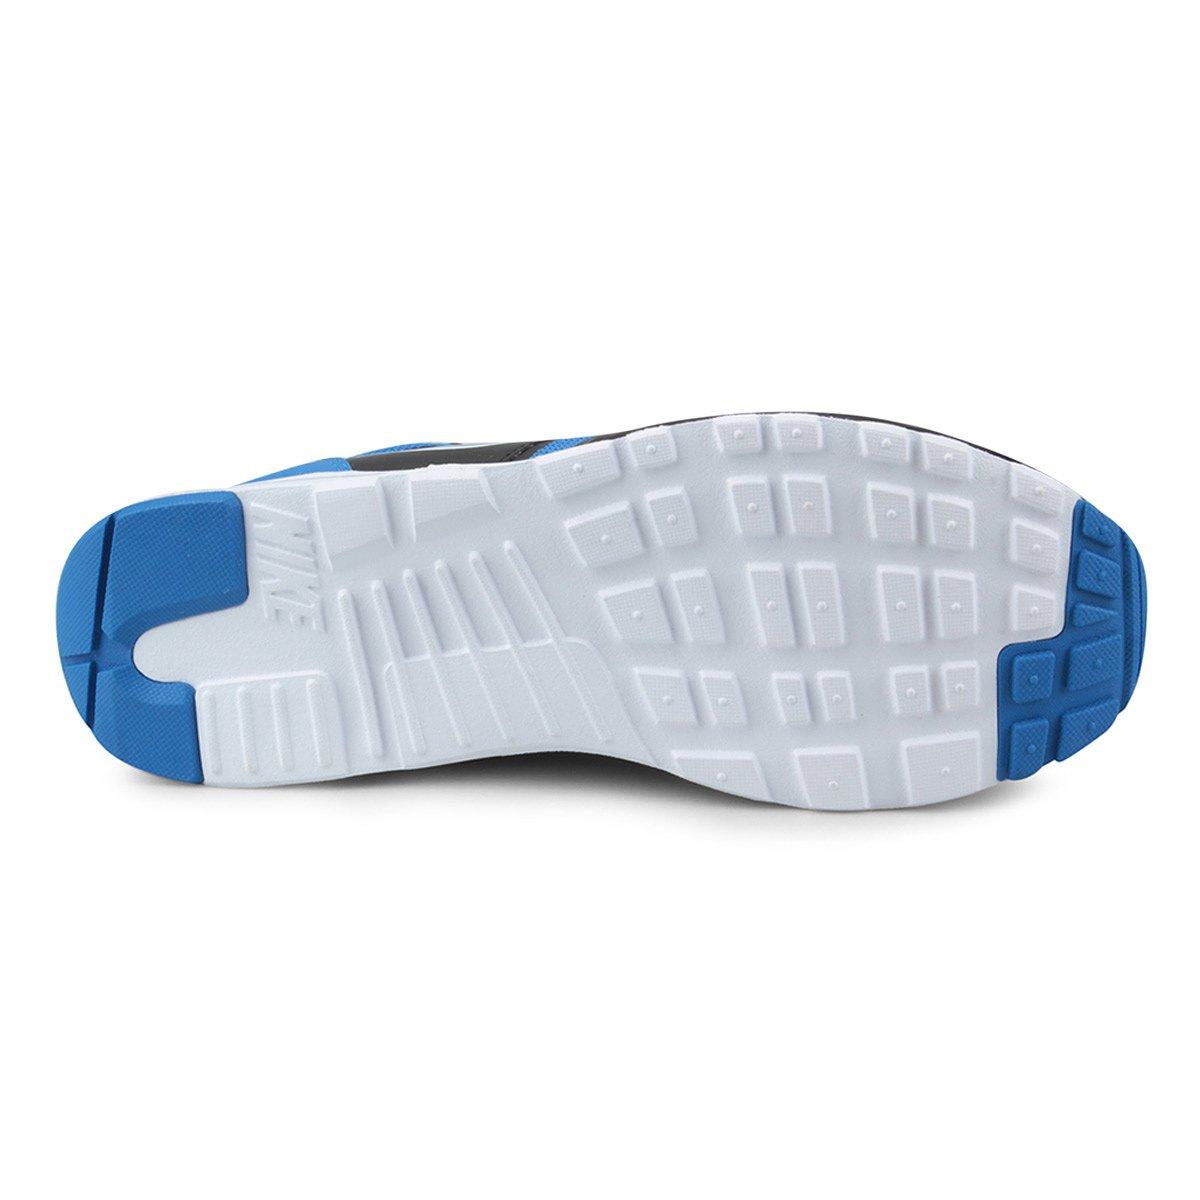 new styles 1a919 5369b ... Tênis Nike Air Max Vision Masculino ...